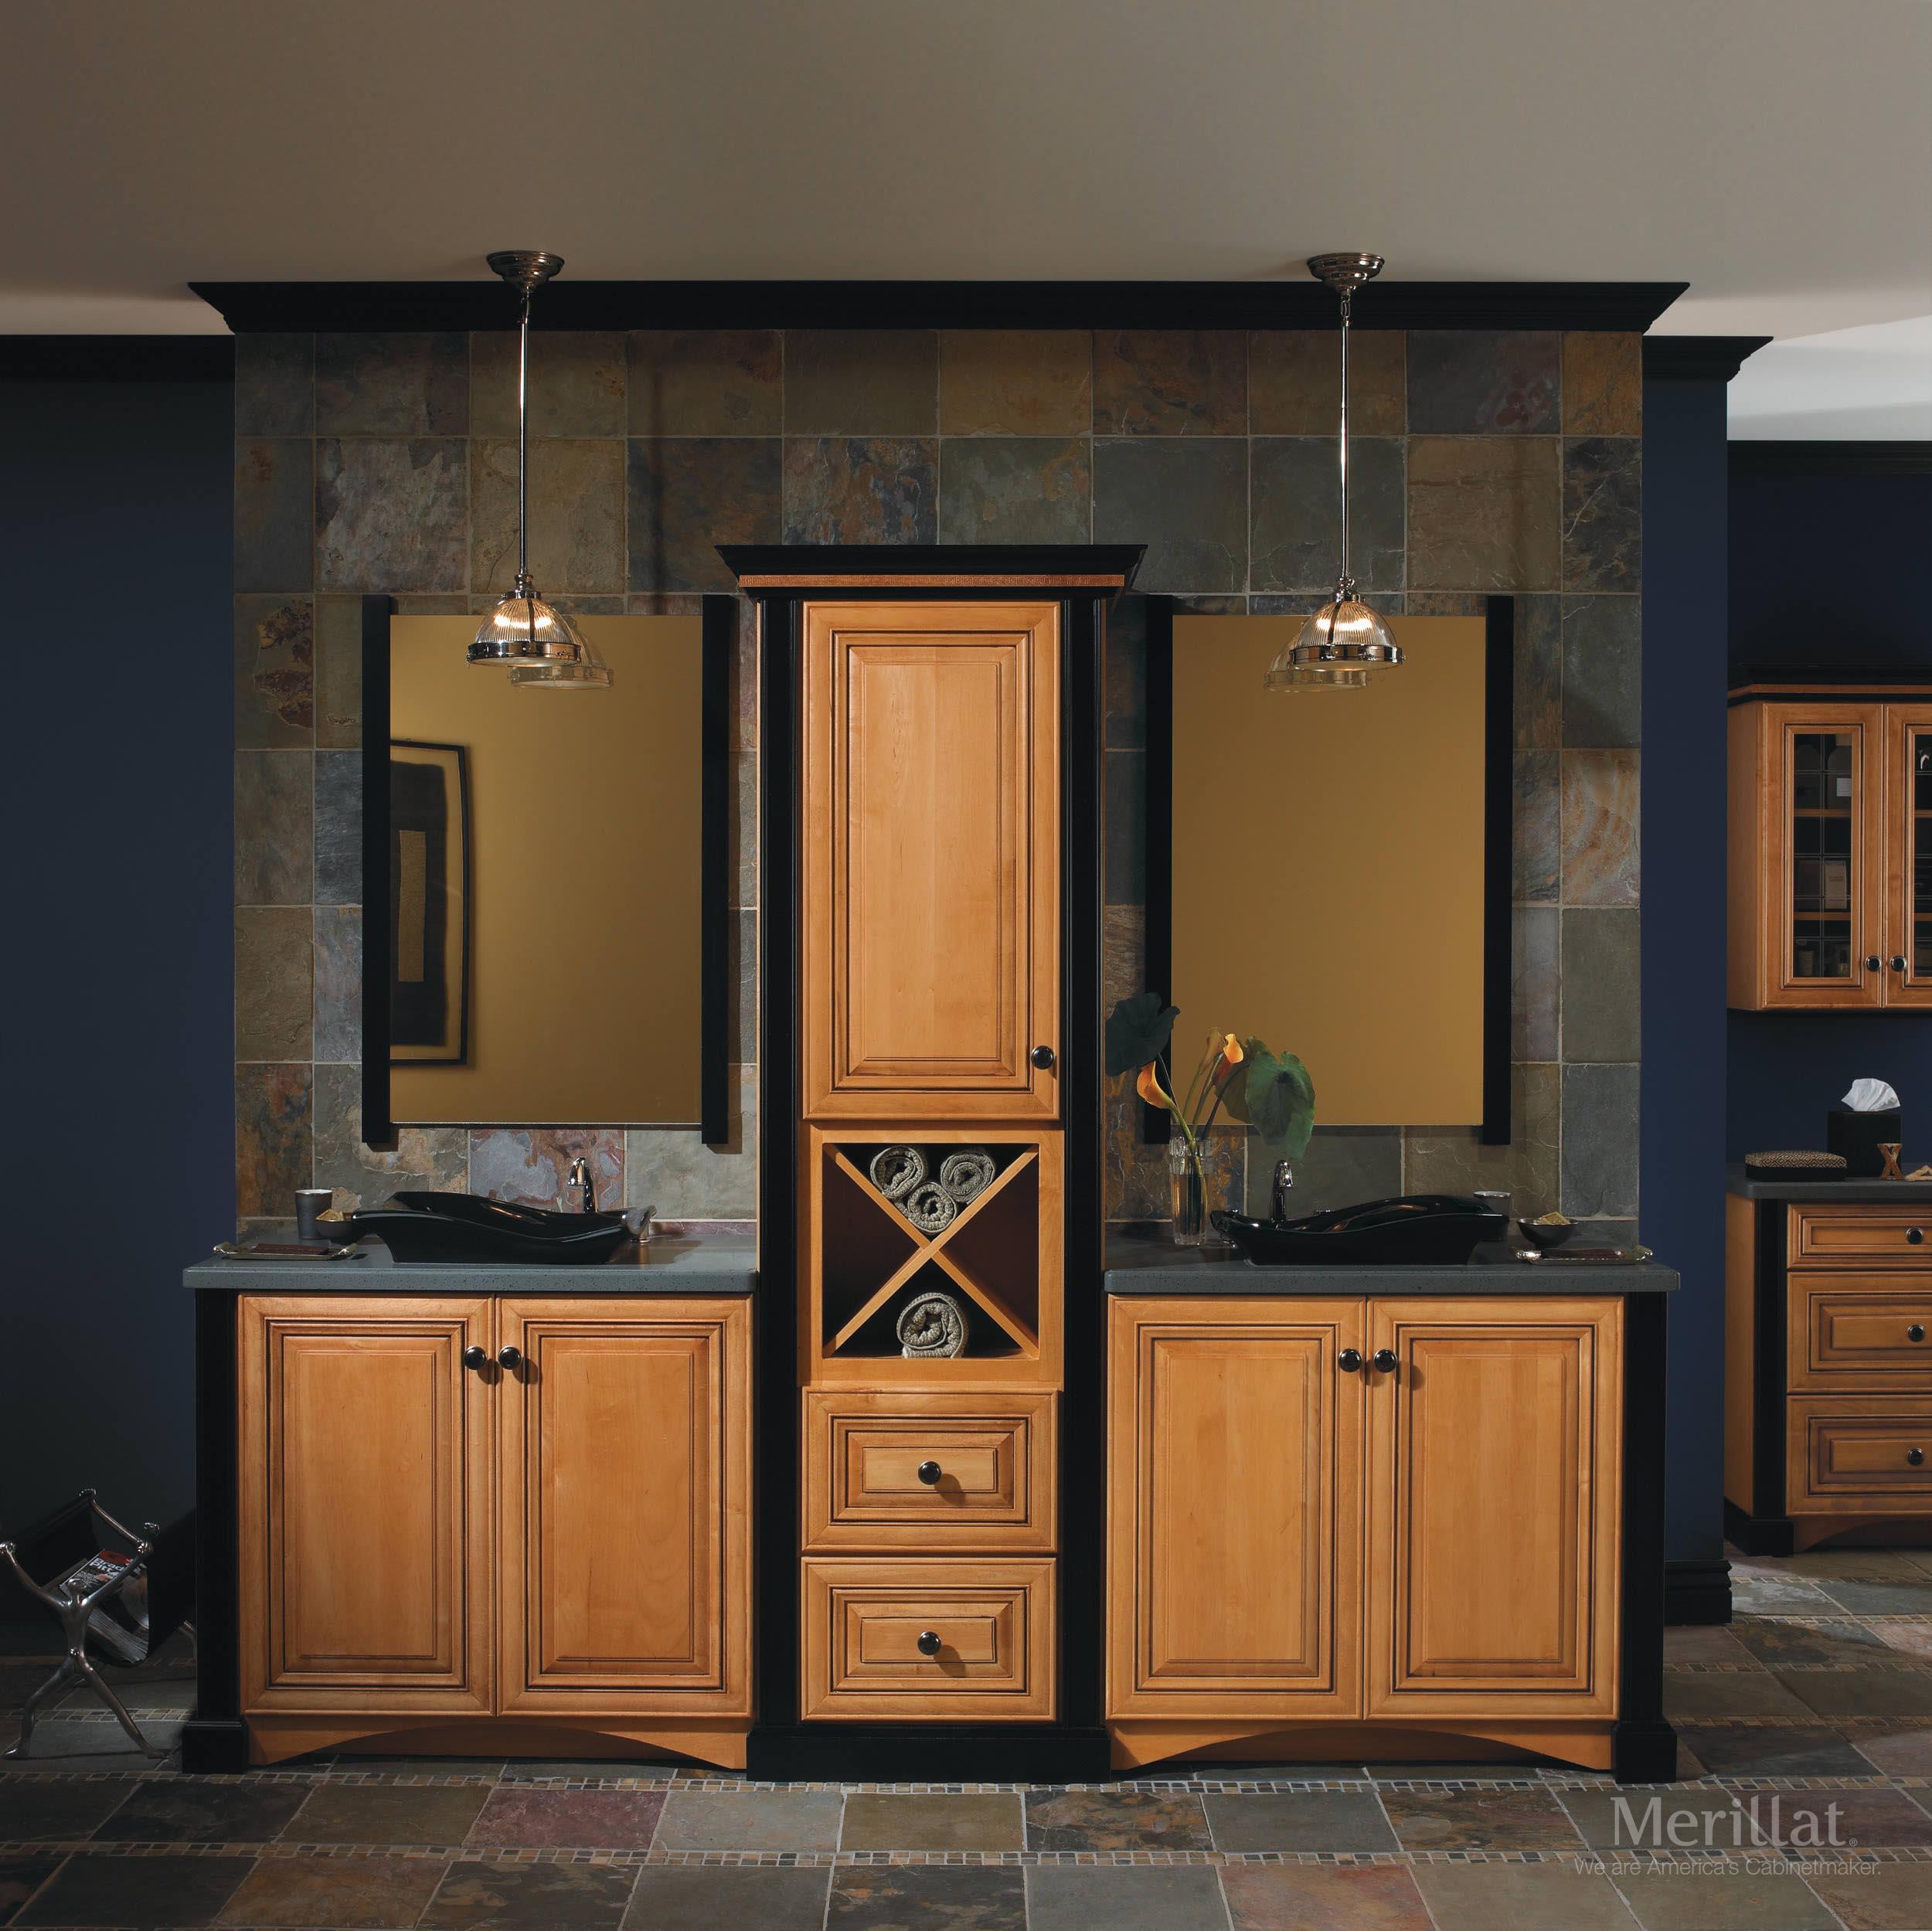 Merillat bathroom vanity - Download Room Image